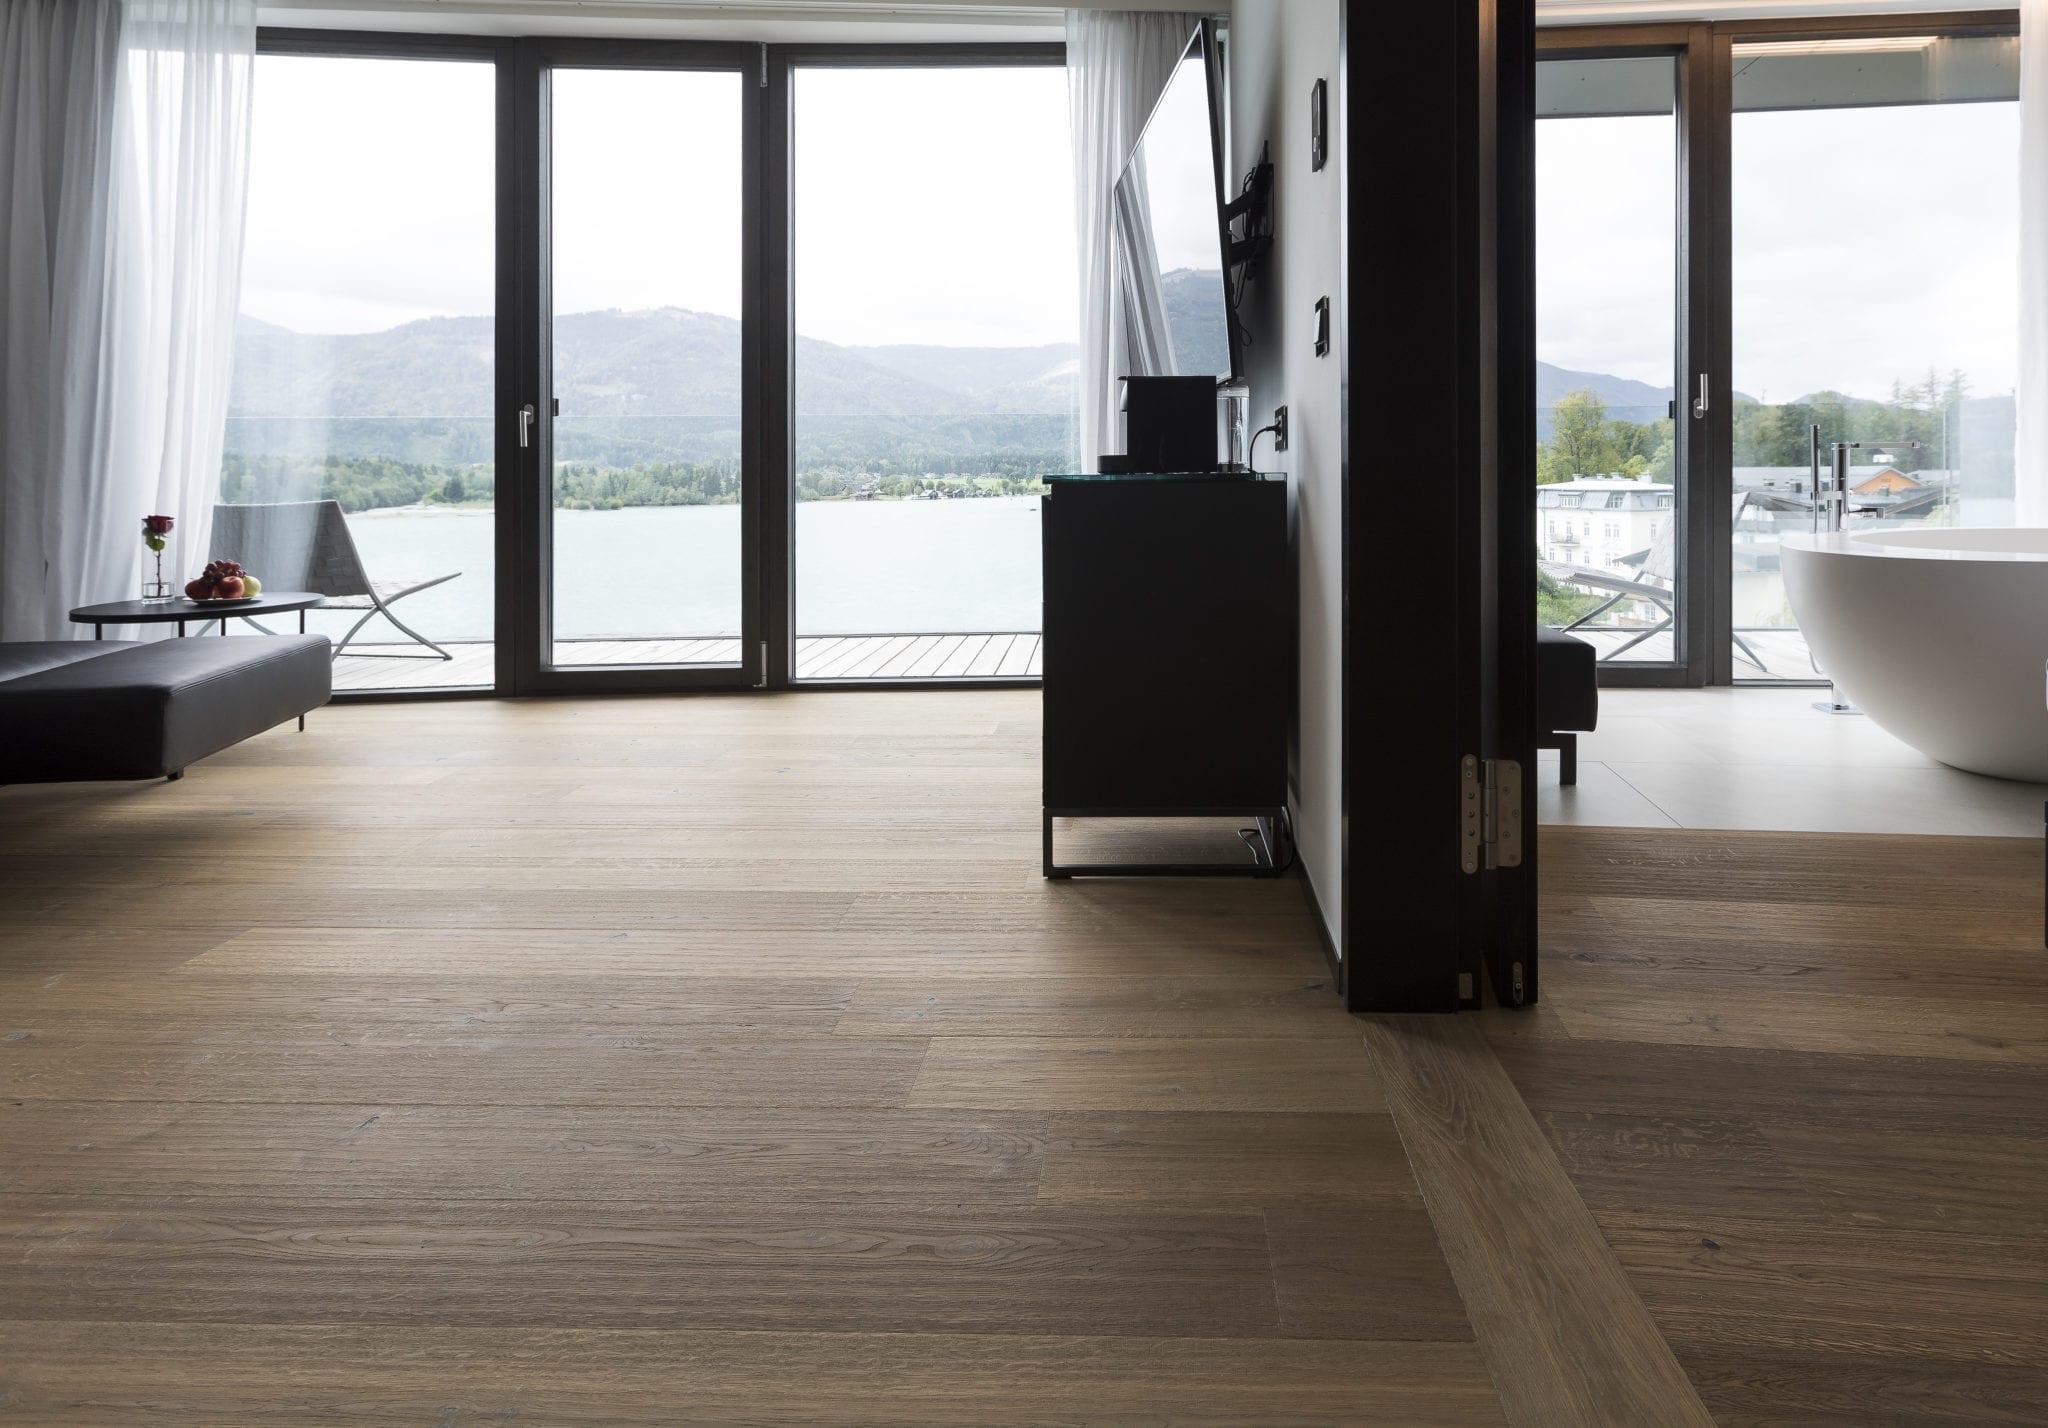 Admonter Floors Eiche Lapis rustic alpin Scalaria Wolfgangsee 6 scaled